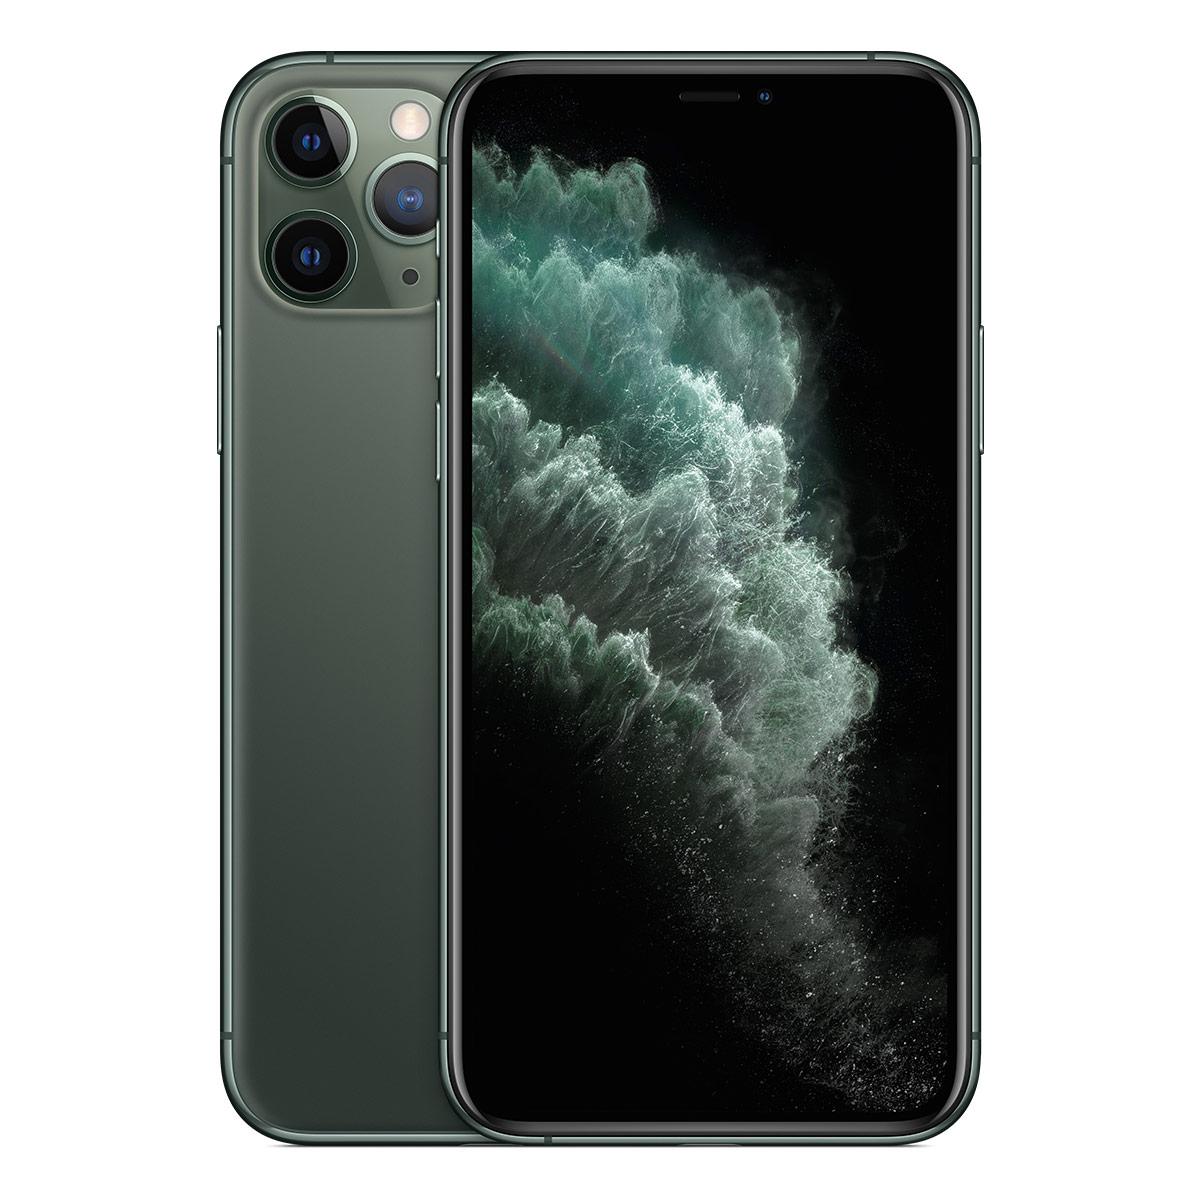 Apple iPhone 11 Pro 256GB Midnight Green - Unlocked